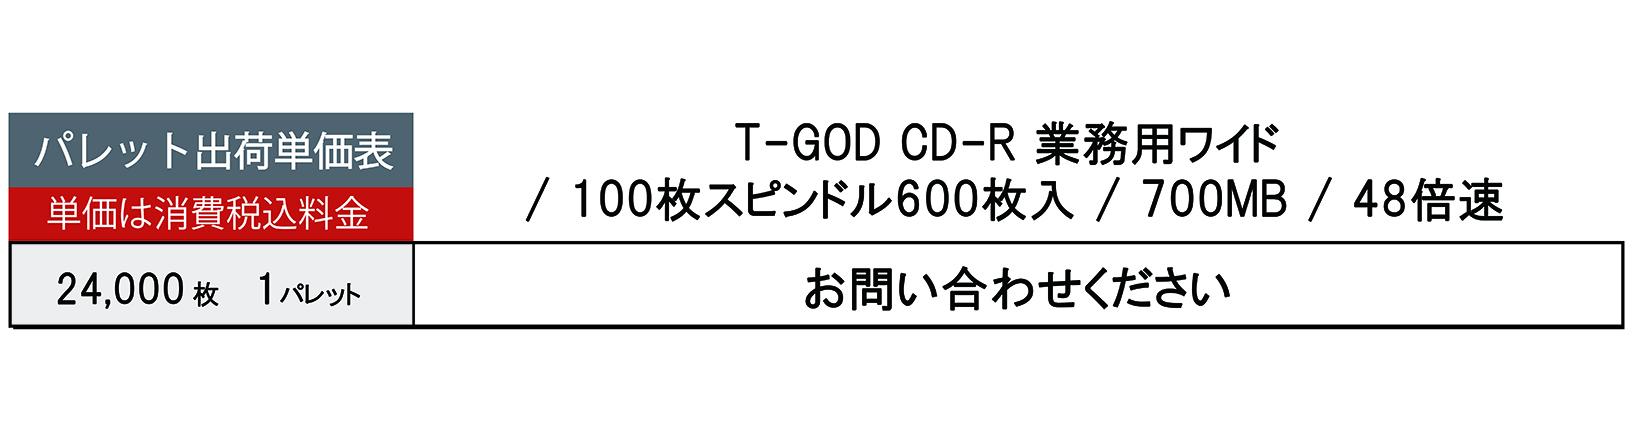 T-GOD大量注文単価表